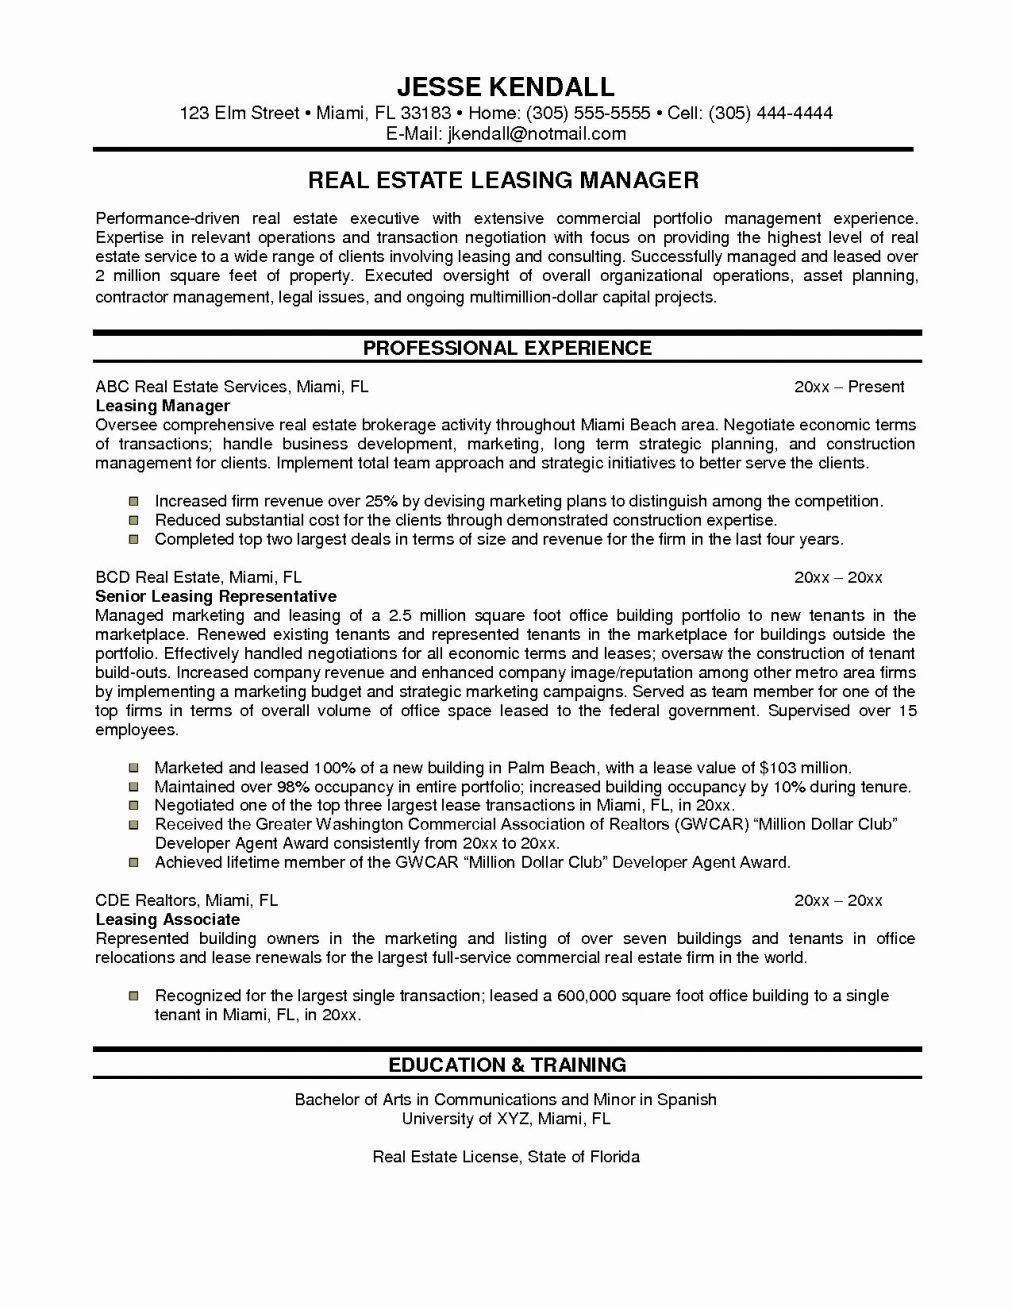 Human Resource Coordinator Resume Template